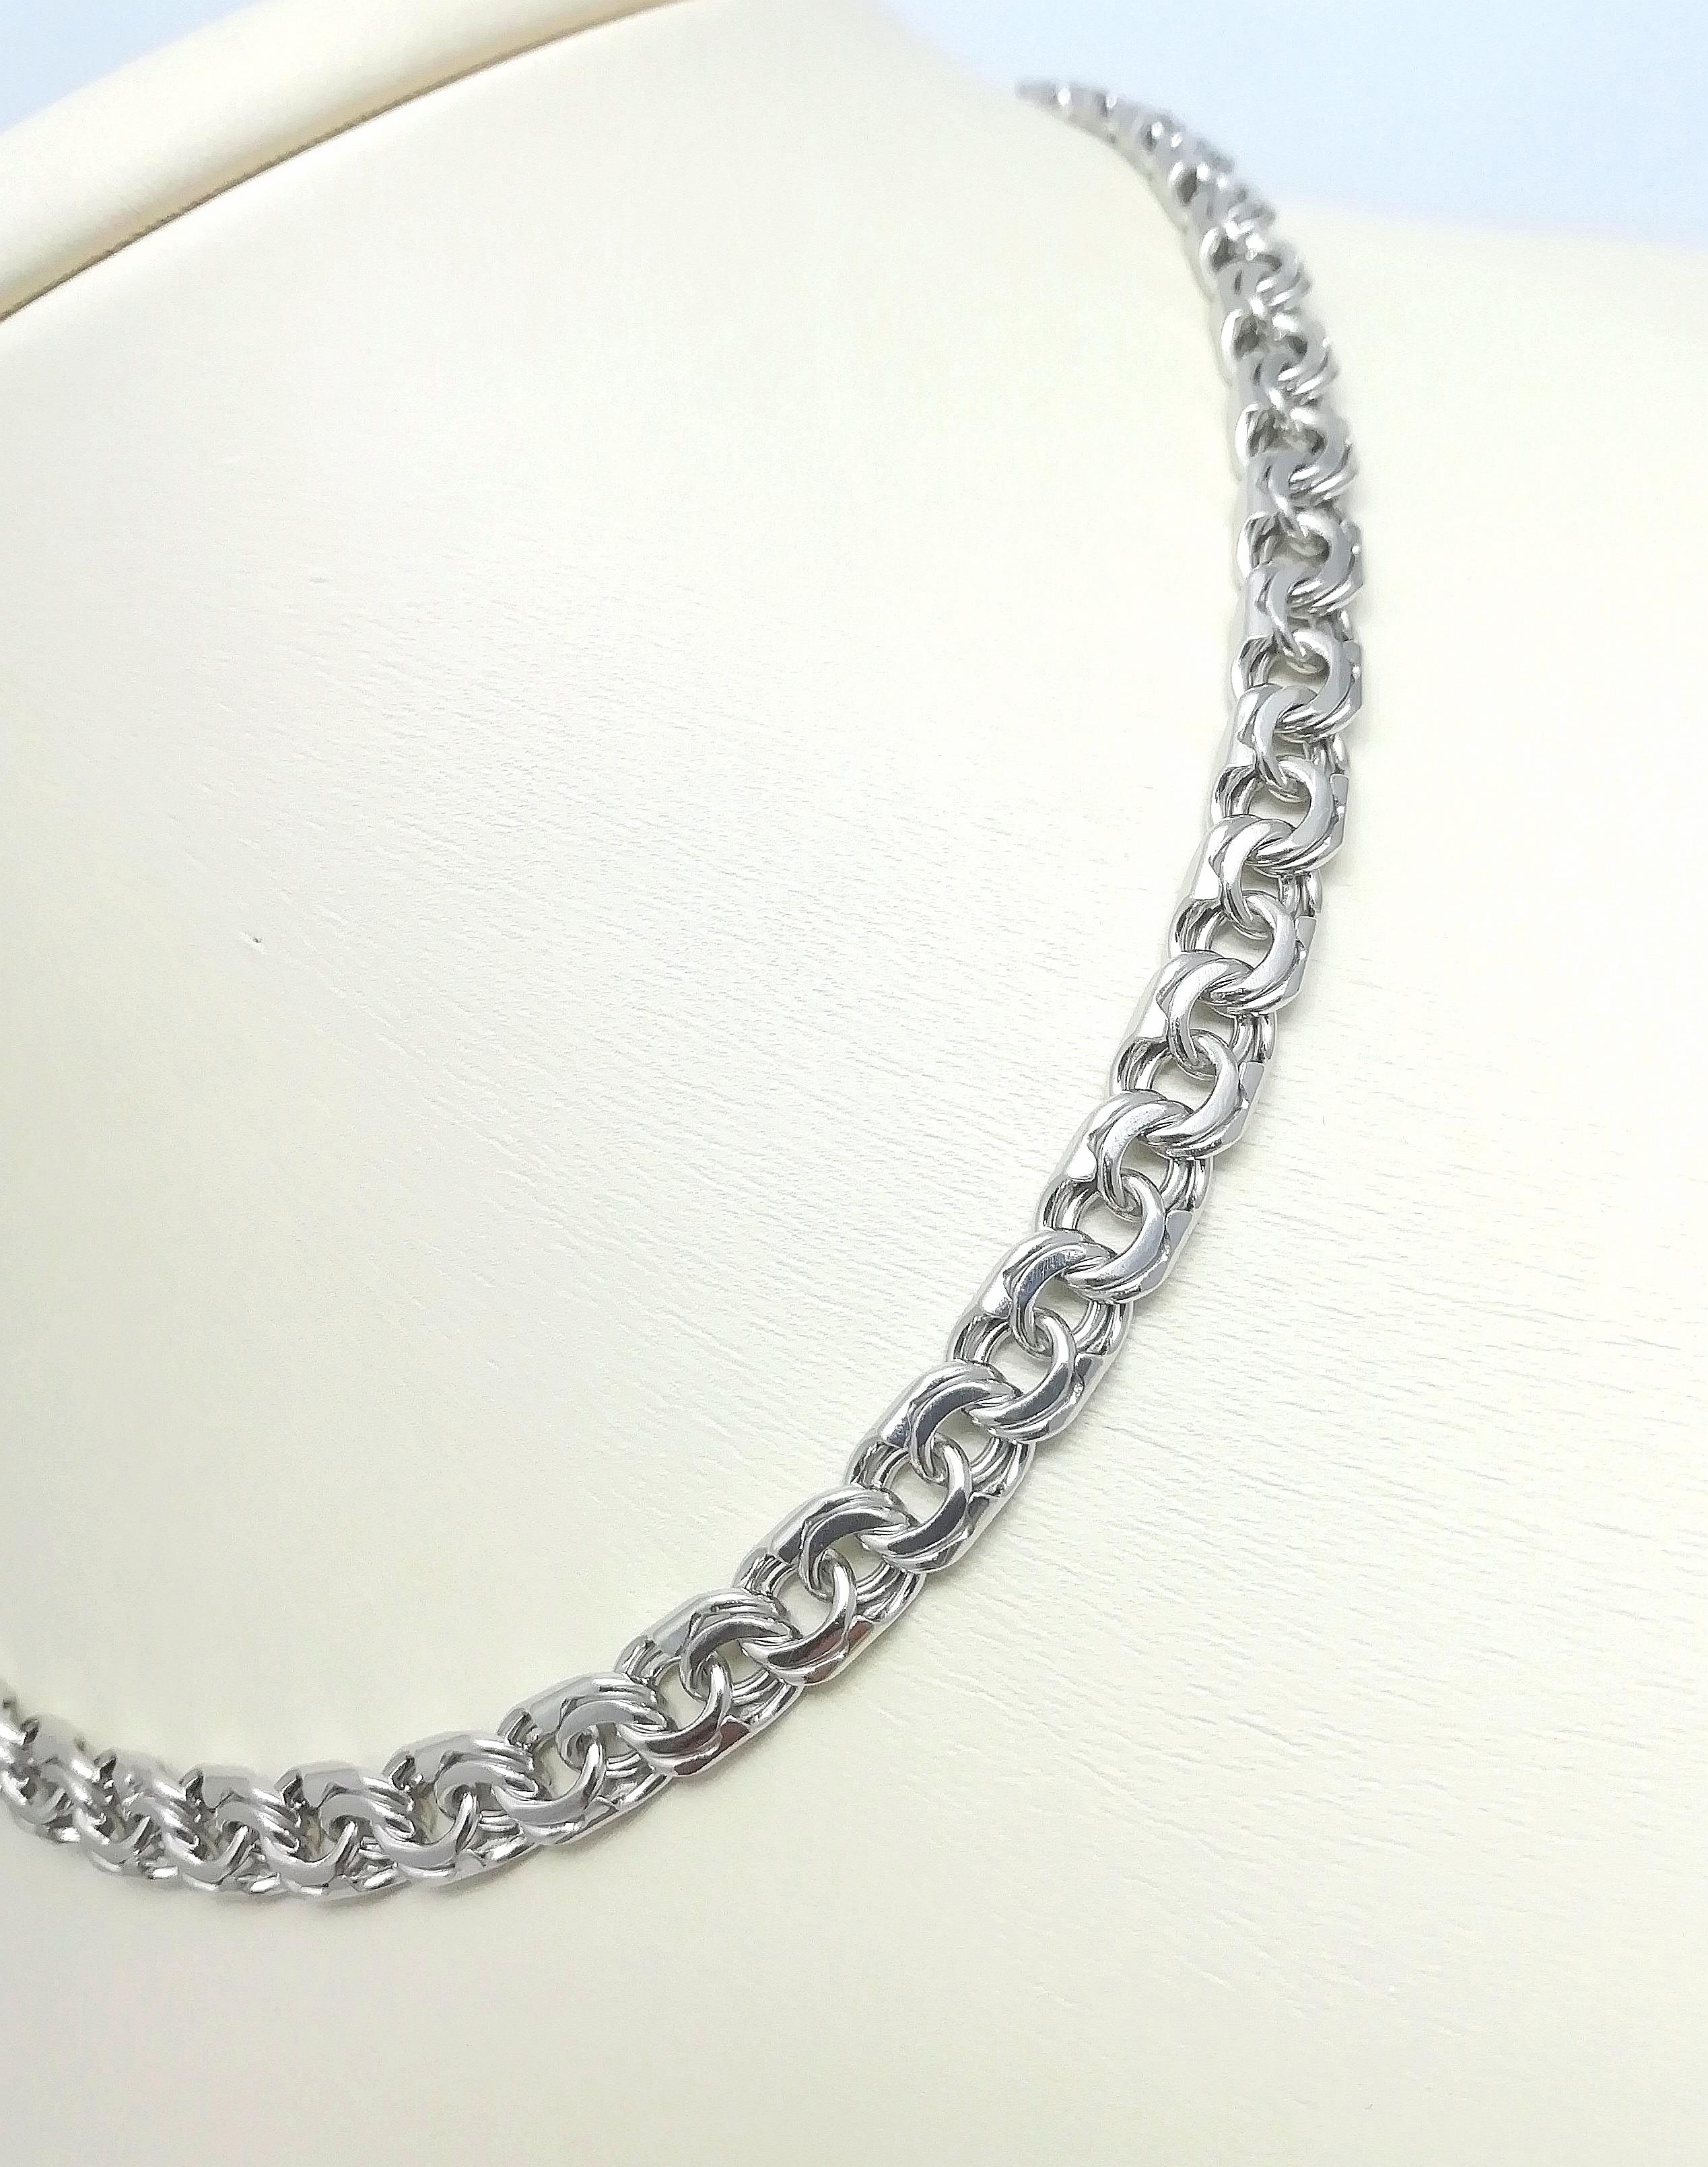 Серебро цепь дк240920-149 29,40гр